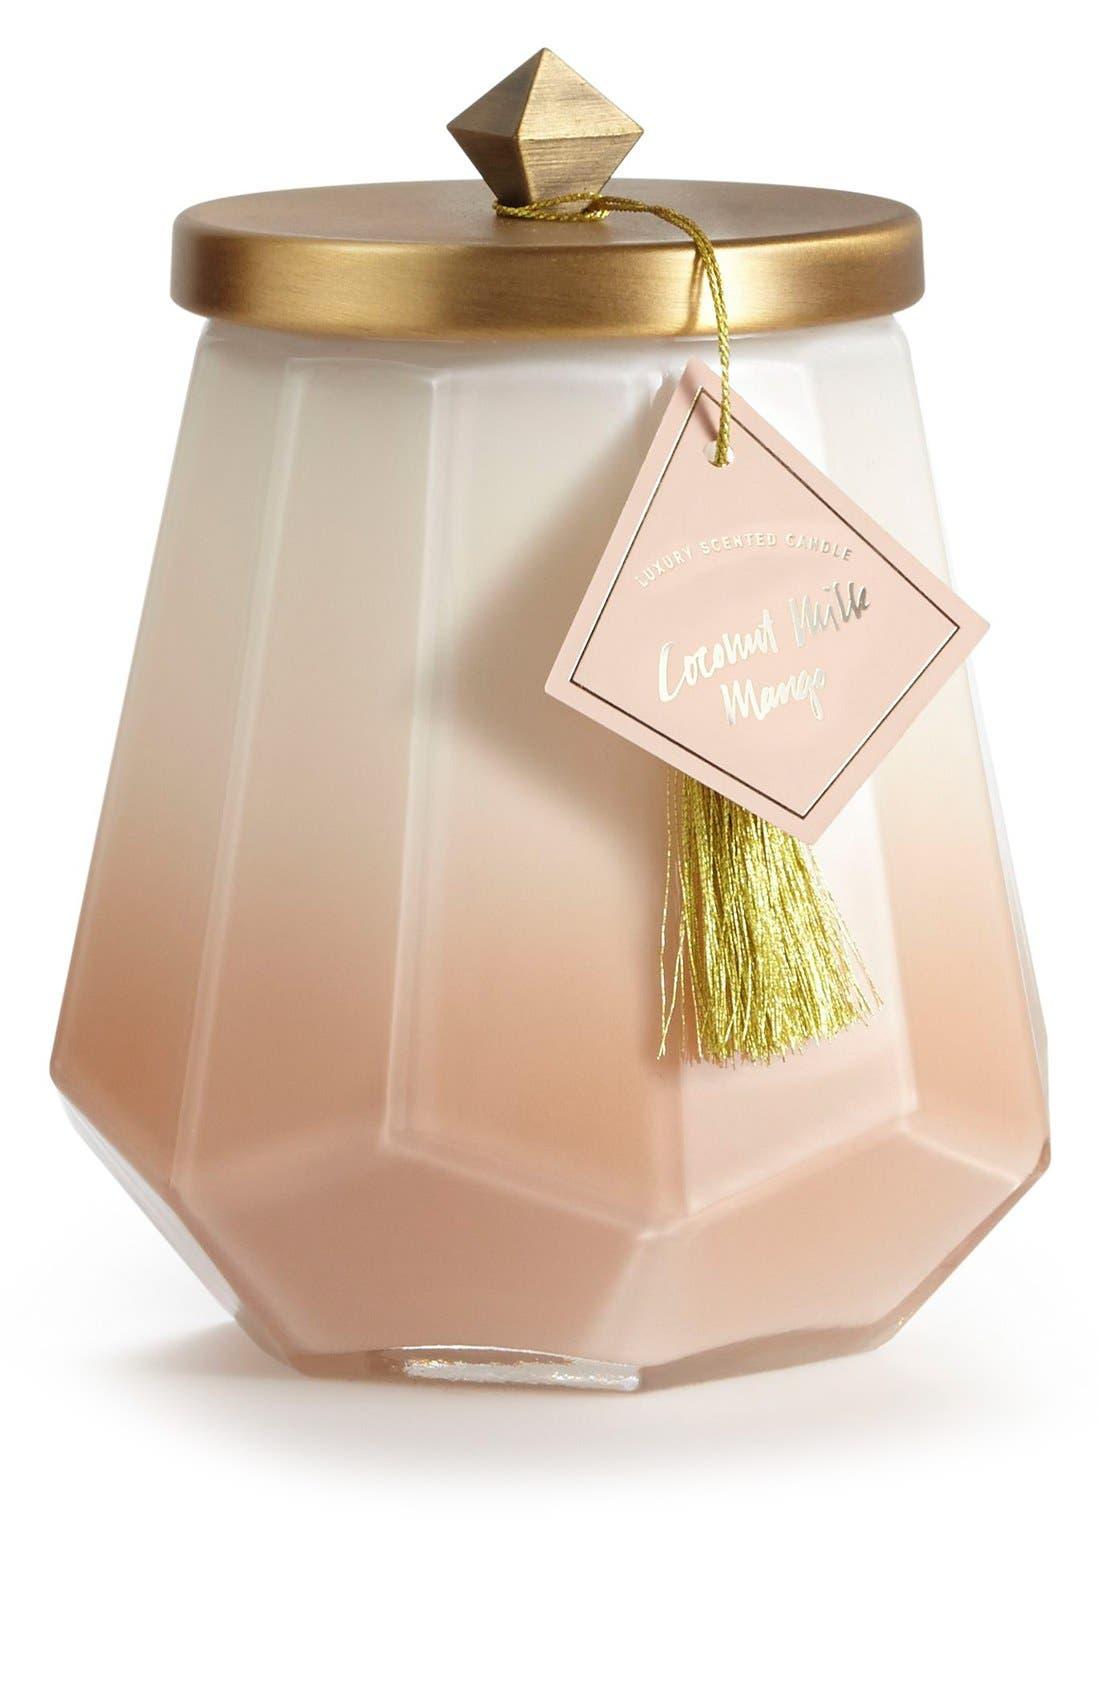 Alternate Image 1 Selected - ILLUME® 'Laurel' Scented Candle Jar